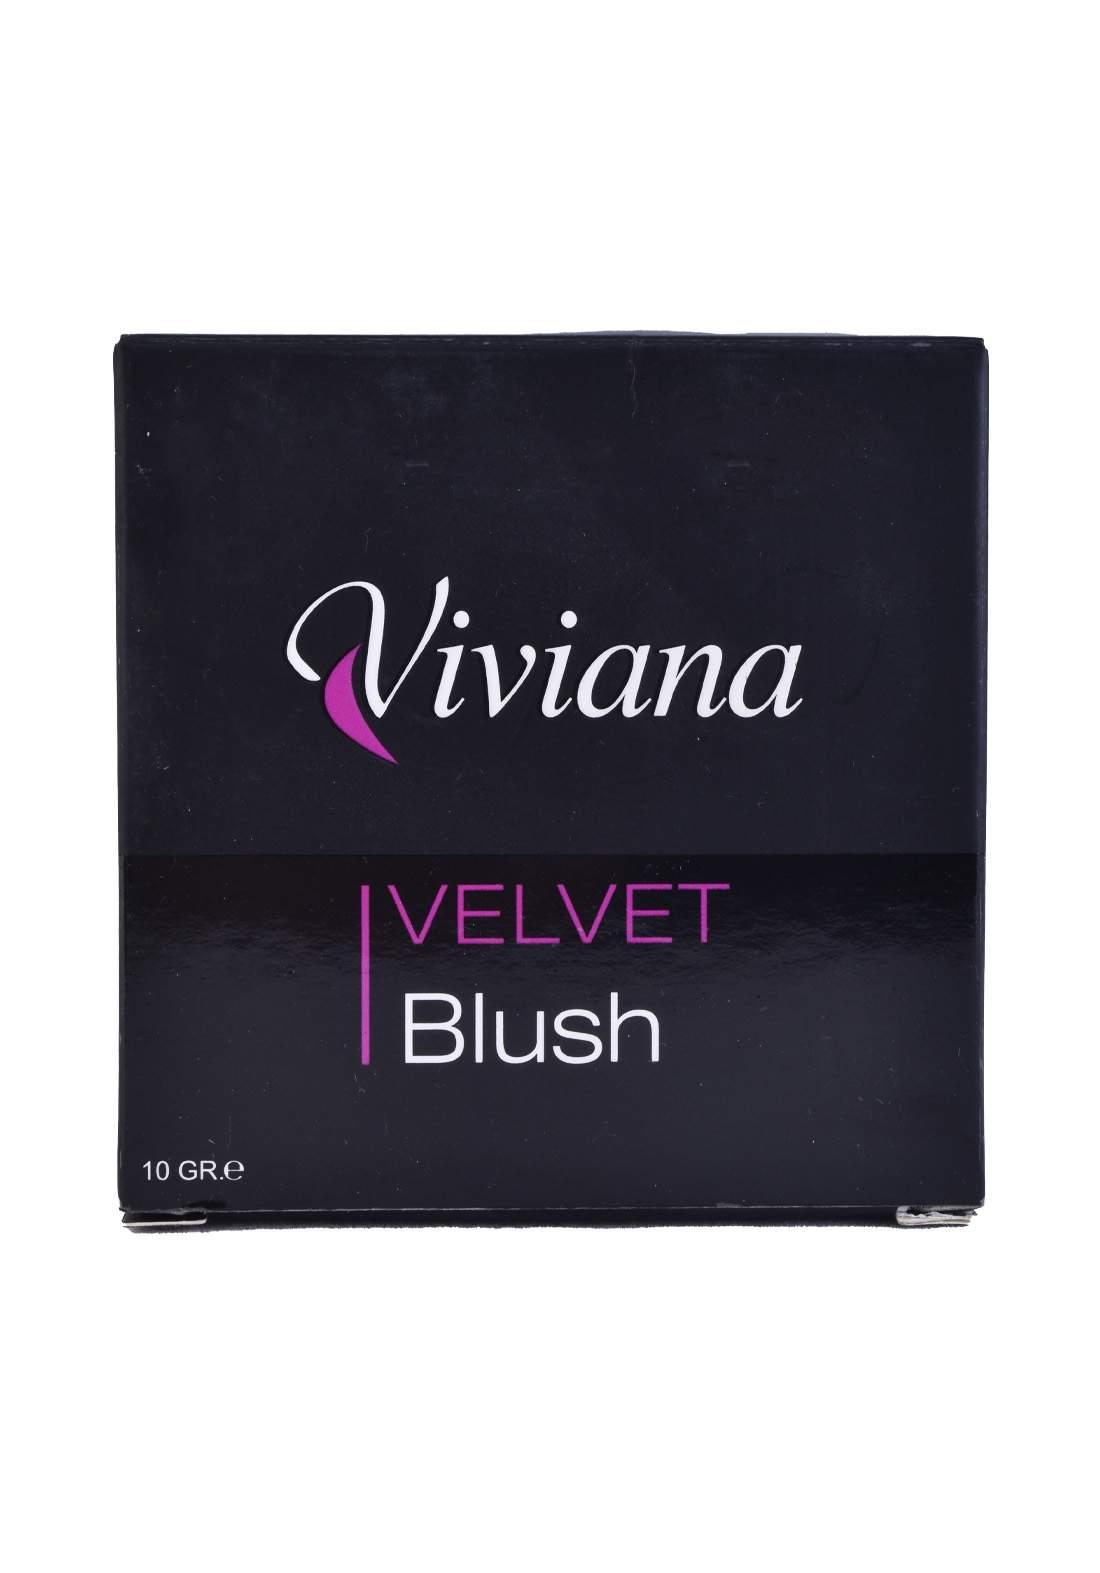 Viviana Velvet Blush No.4 10g احمر خدود